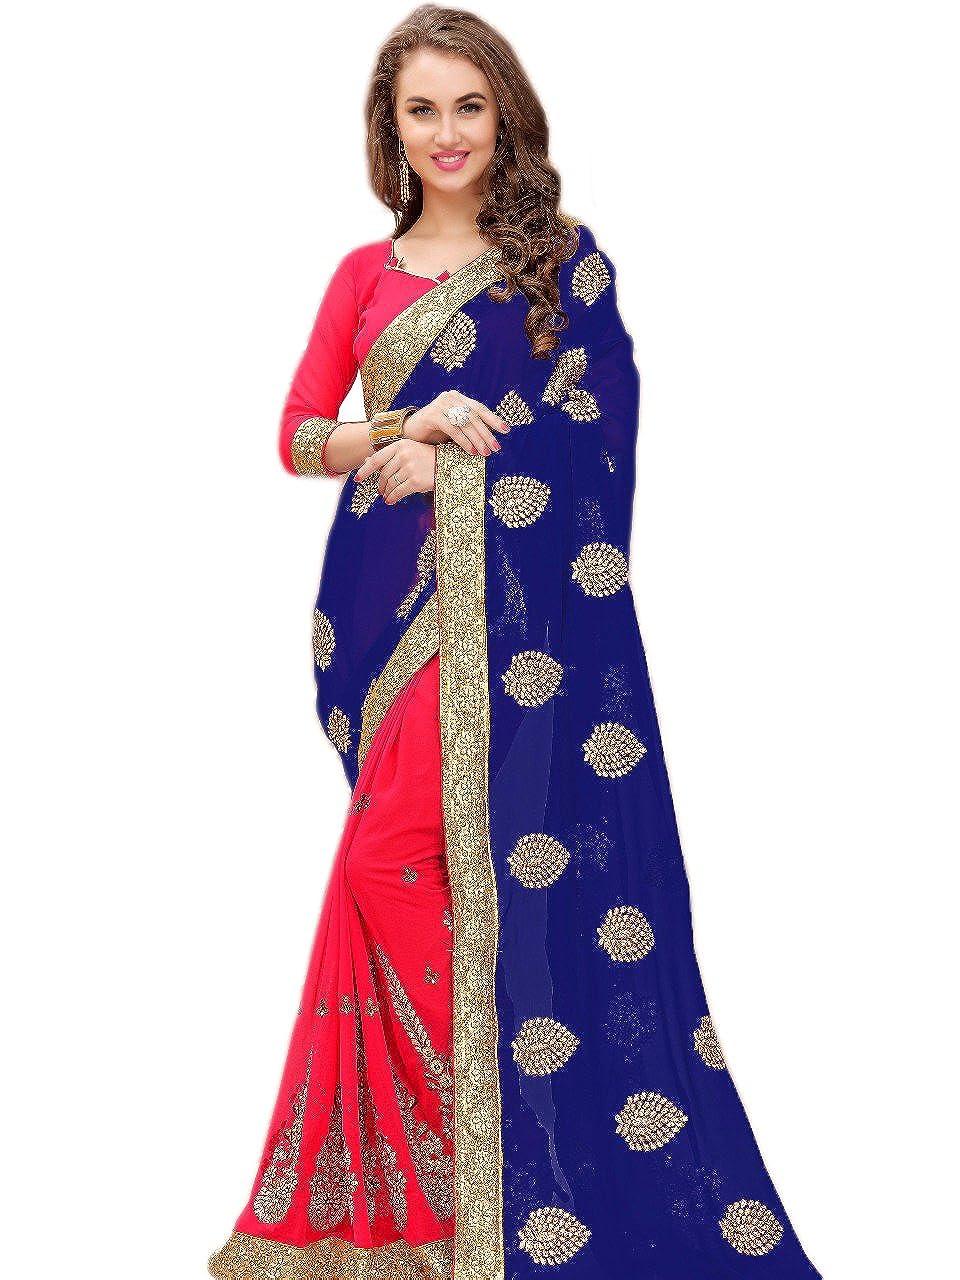 KIMANA Indian Designer Ethnic Bollywood Traditional Georgette Saree Sari S3864 51003864